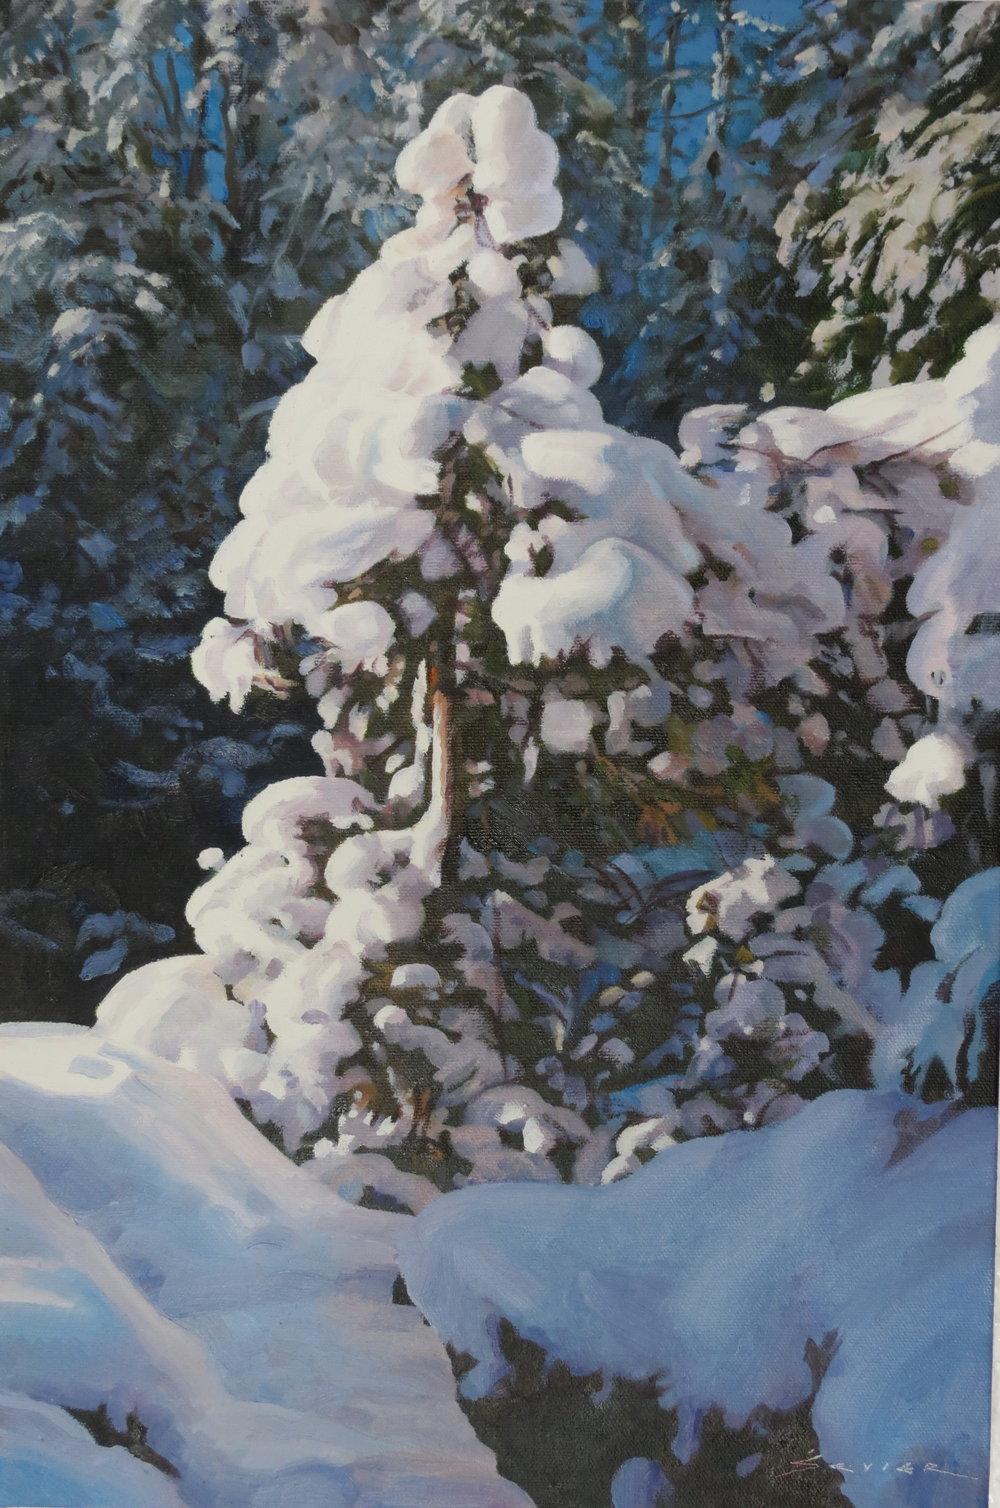 New Snow, 18 x 12, oil